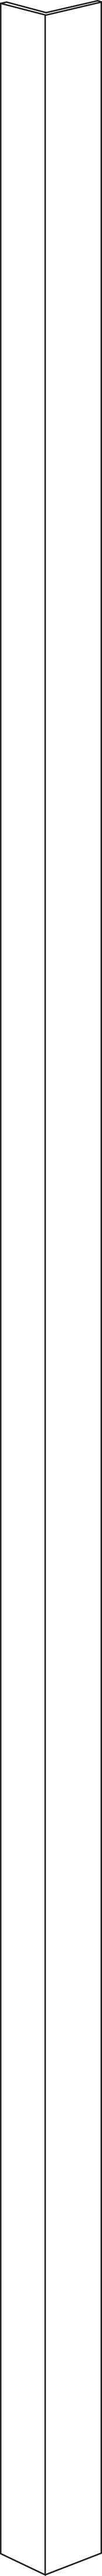 Sidolist S62 175 CM H/V. Vit